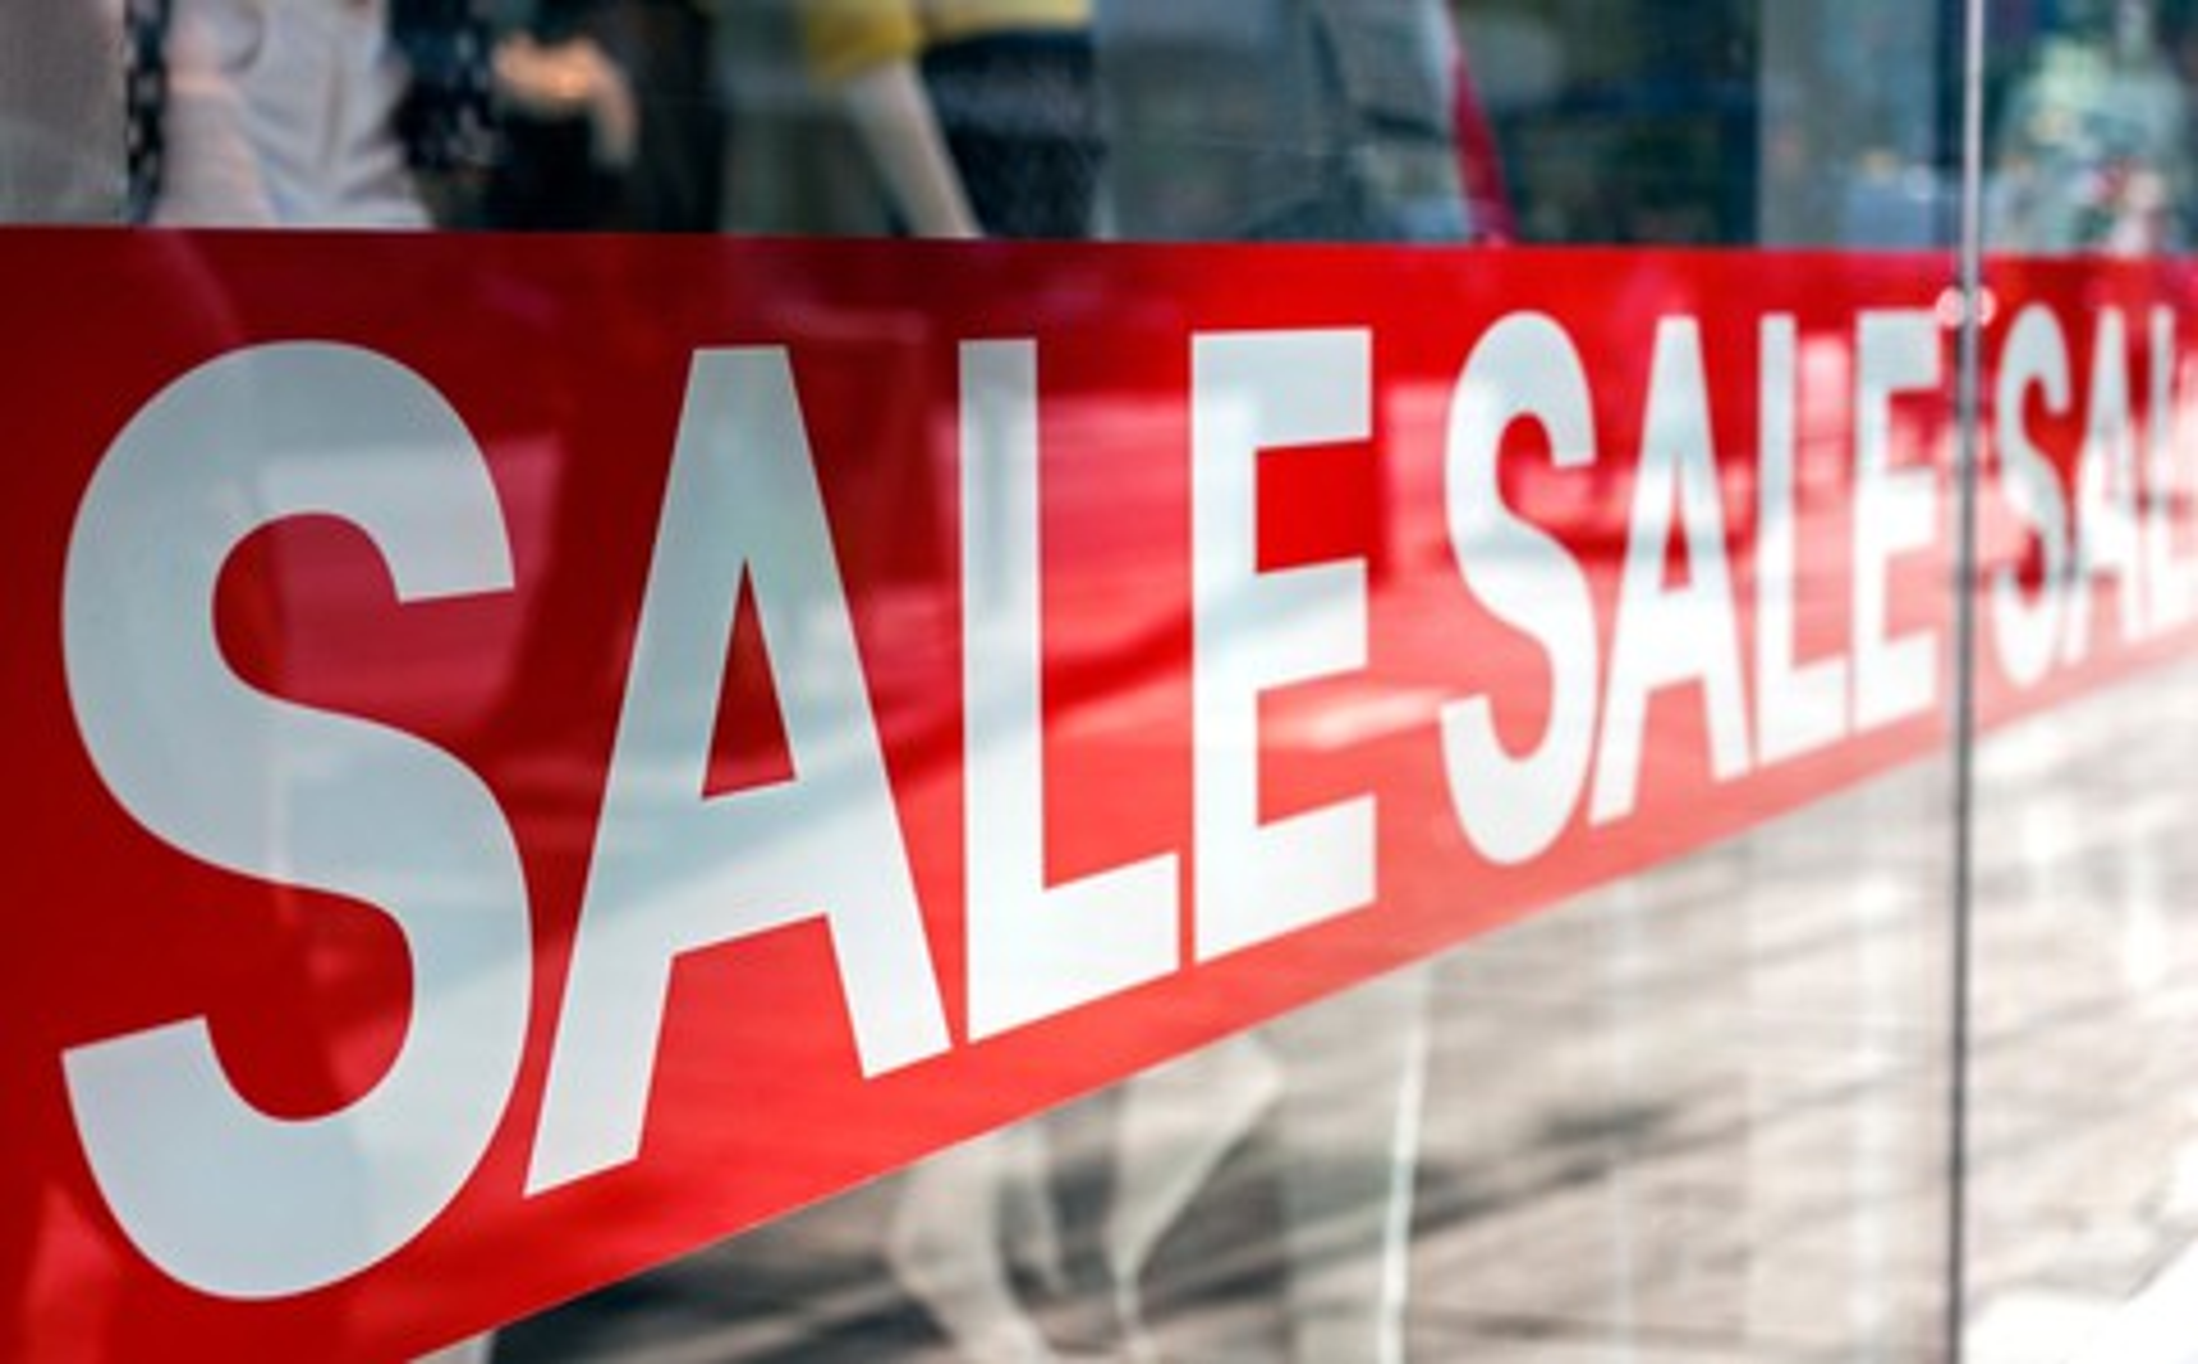 Getty Sale Sign Shop Window